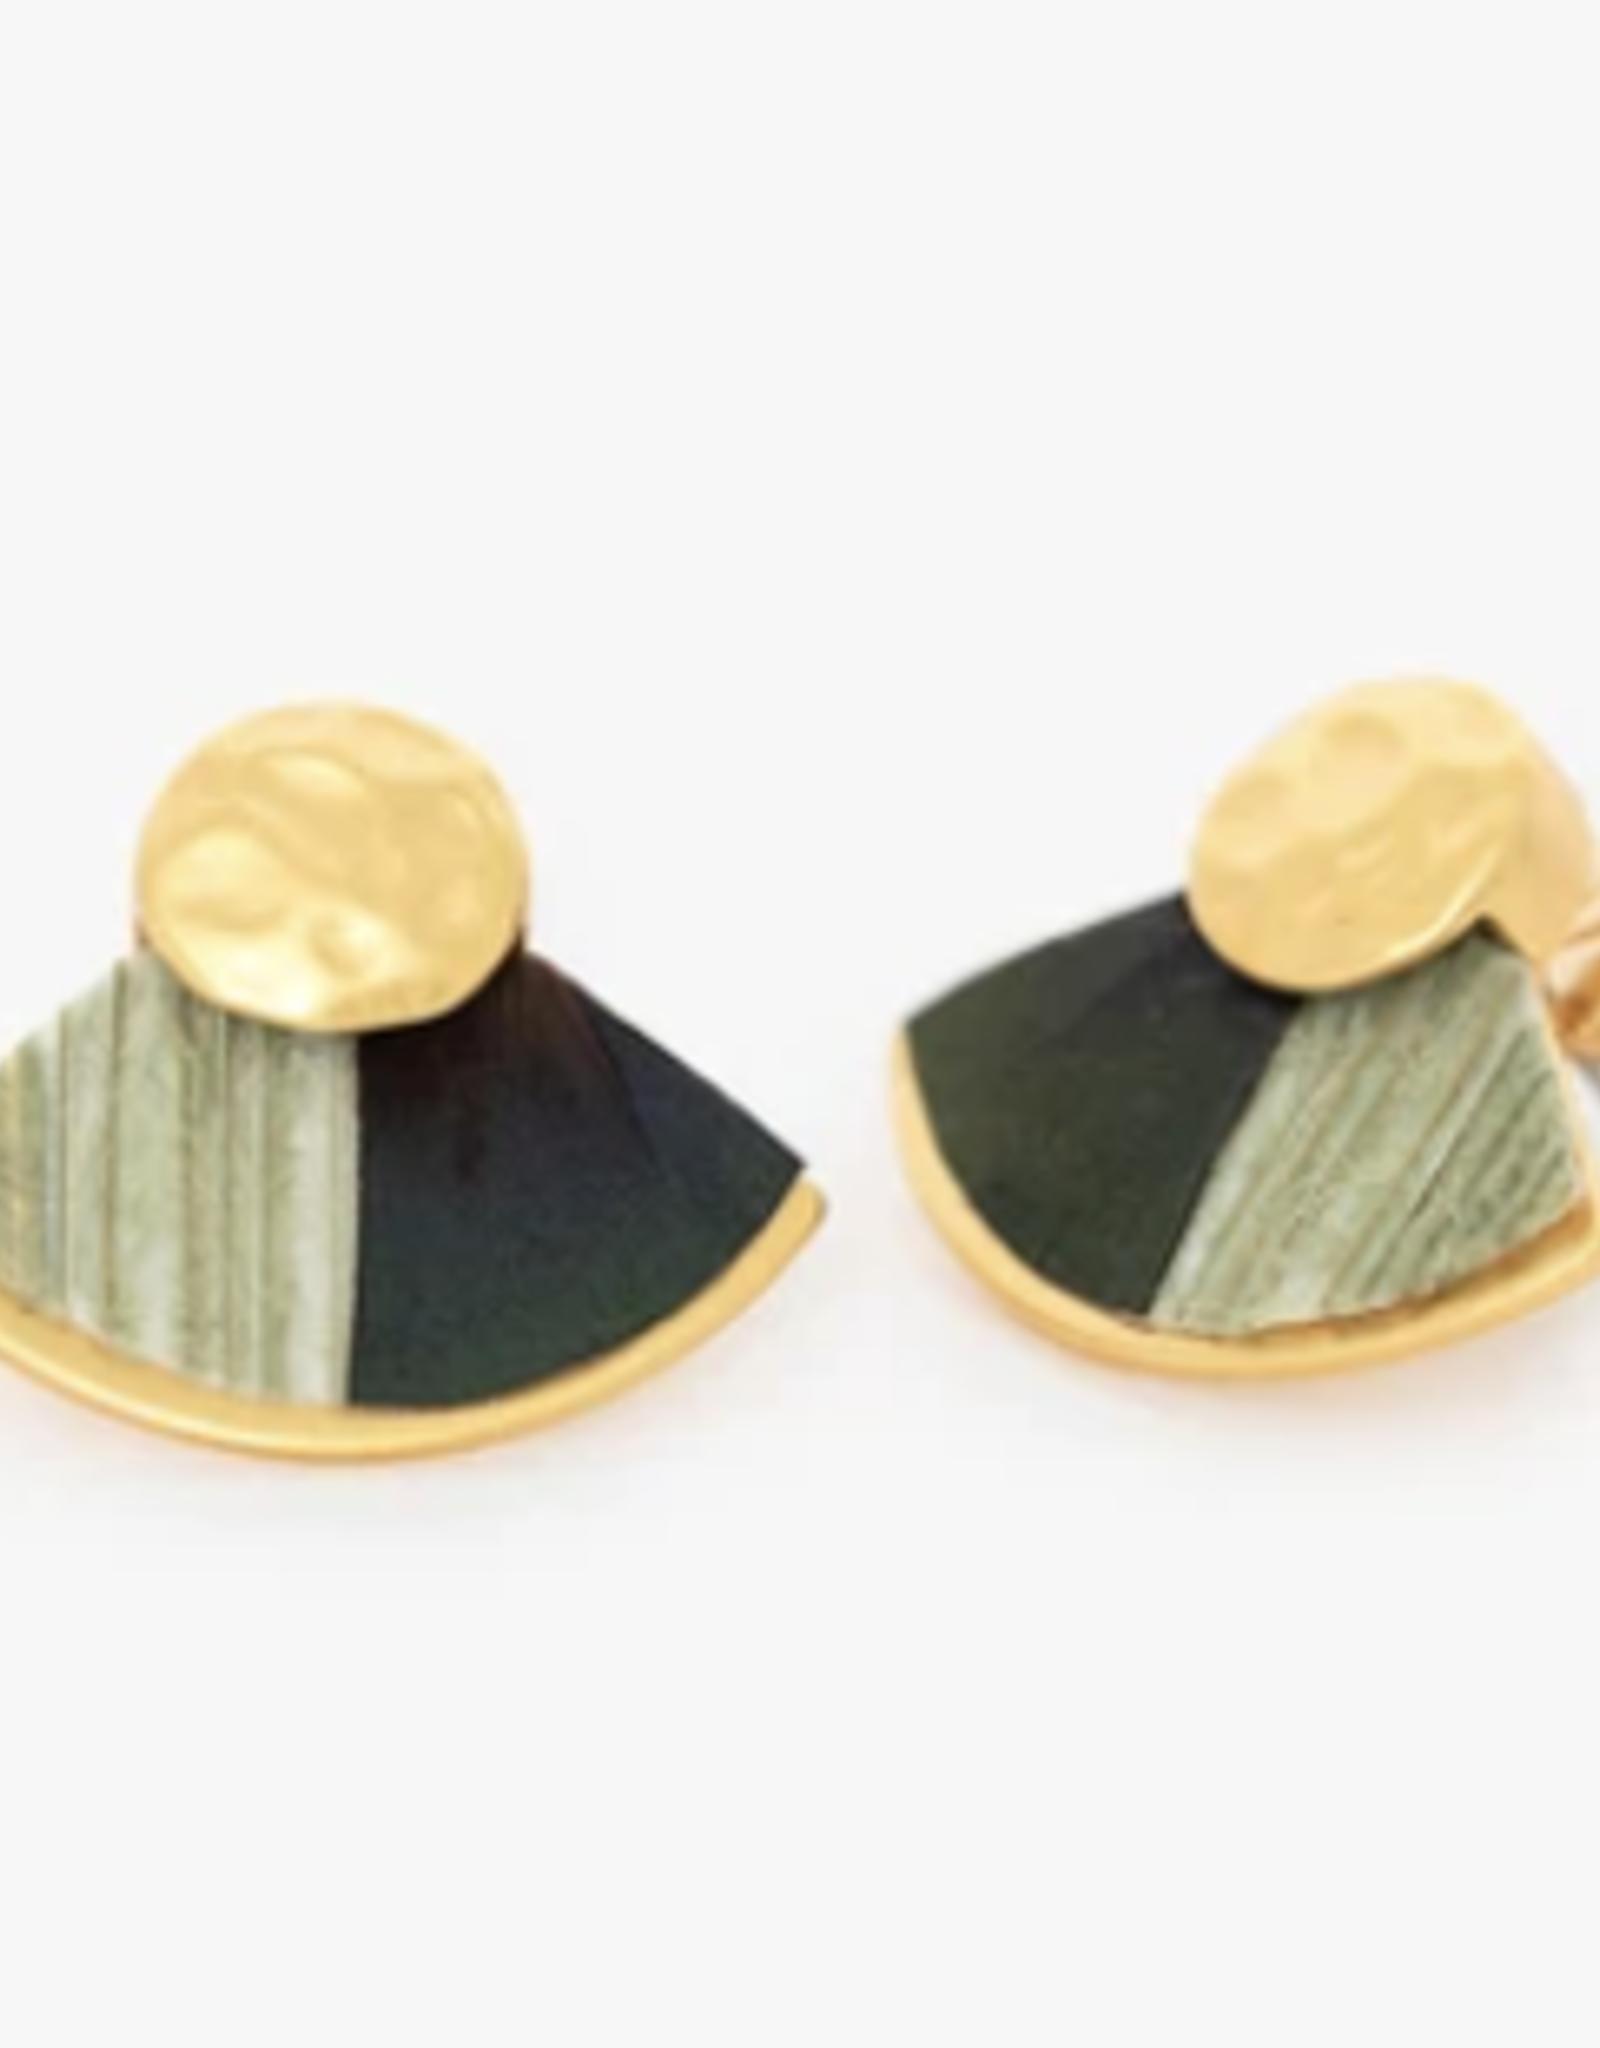 Brackish Spruce Fan Earrings - Peacock and Pheasant Feathers